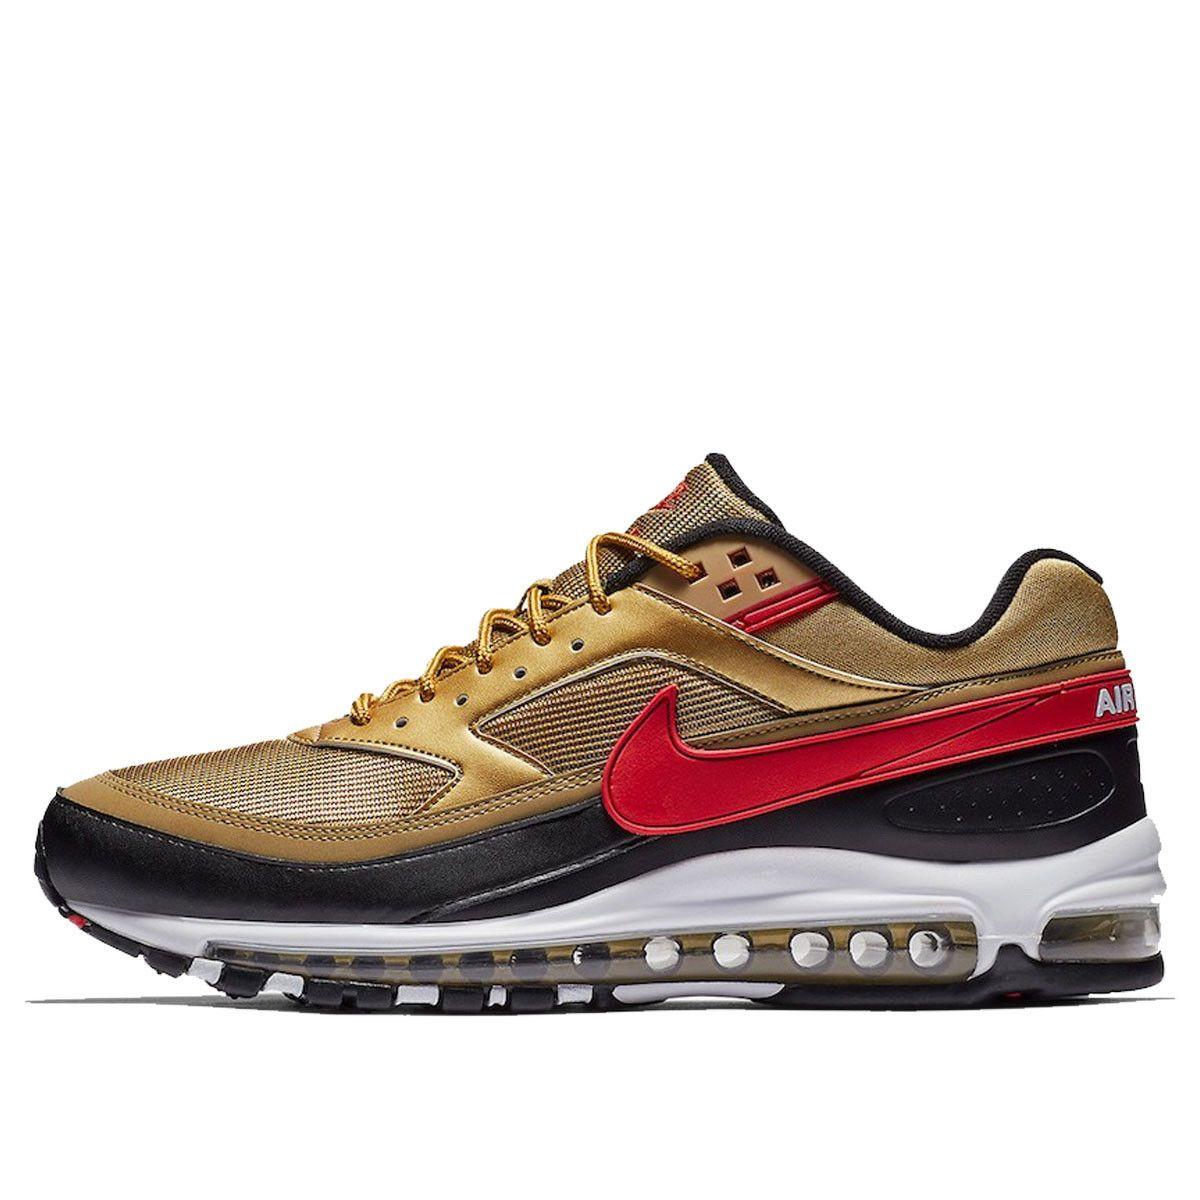 magasin en ligne 68350 5a5c2 Basket Nike AIR MAX 97/BW - Pegashoes